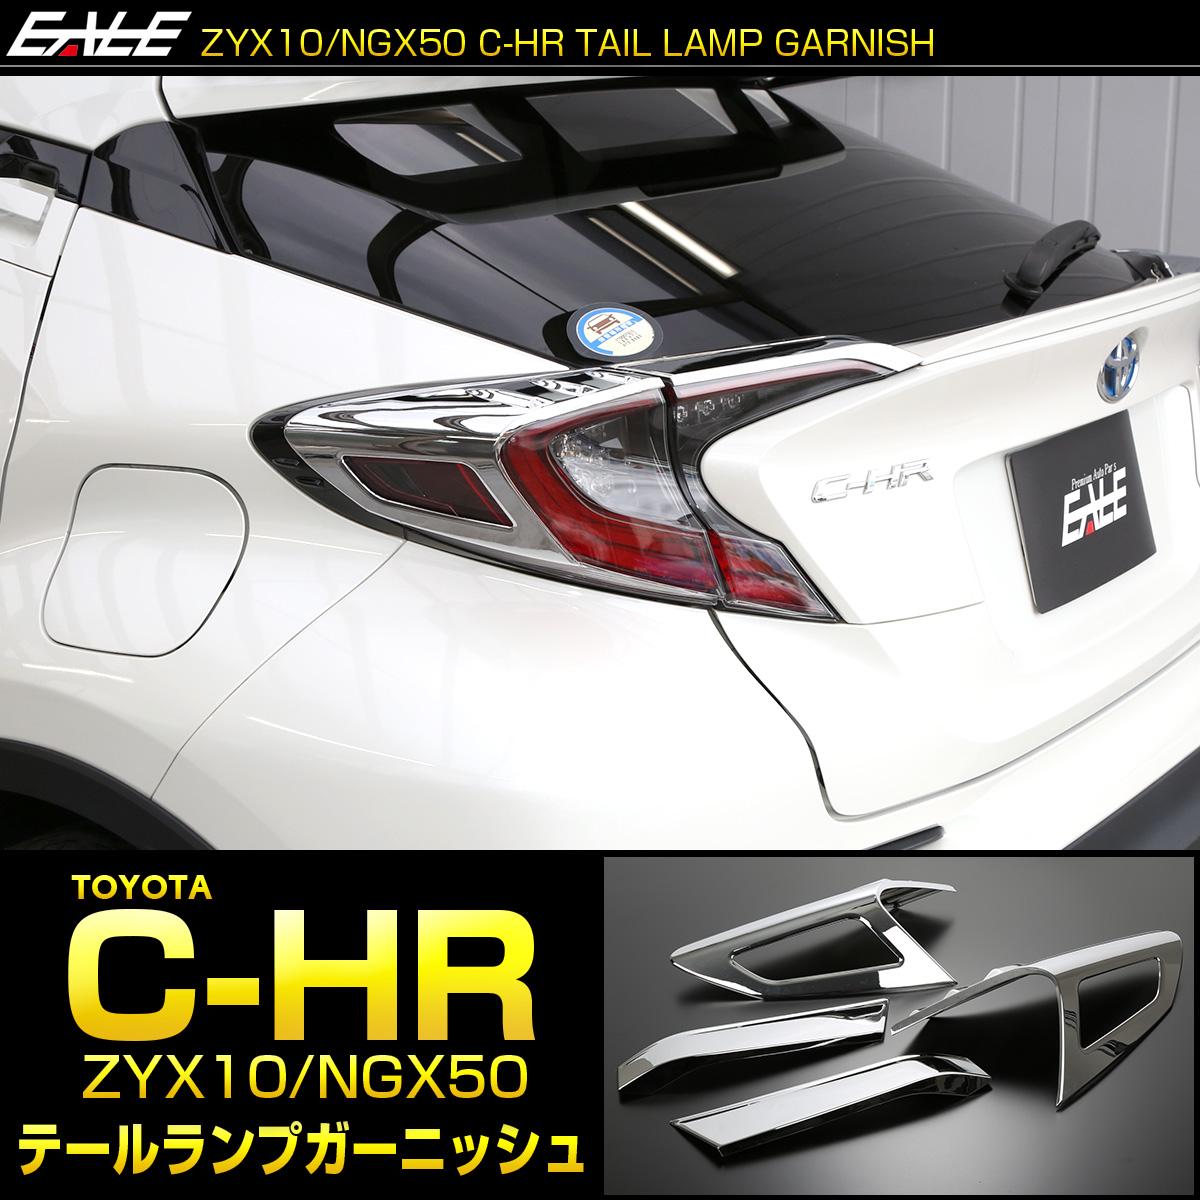 C-HR メッキ テールランプ ガーニッシュ ZYX10 NGX50 メッキパーツ テールランプ トリム LB0014